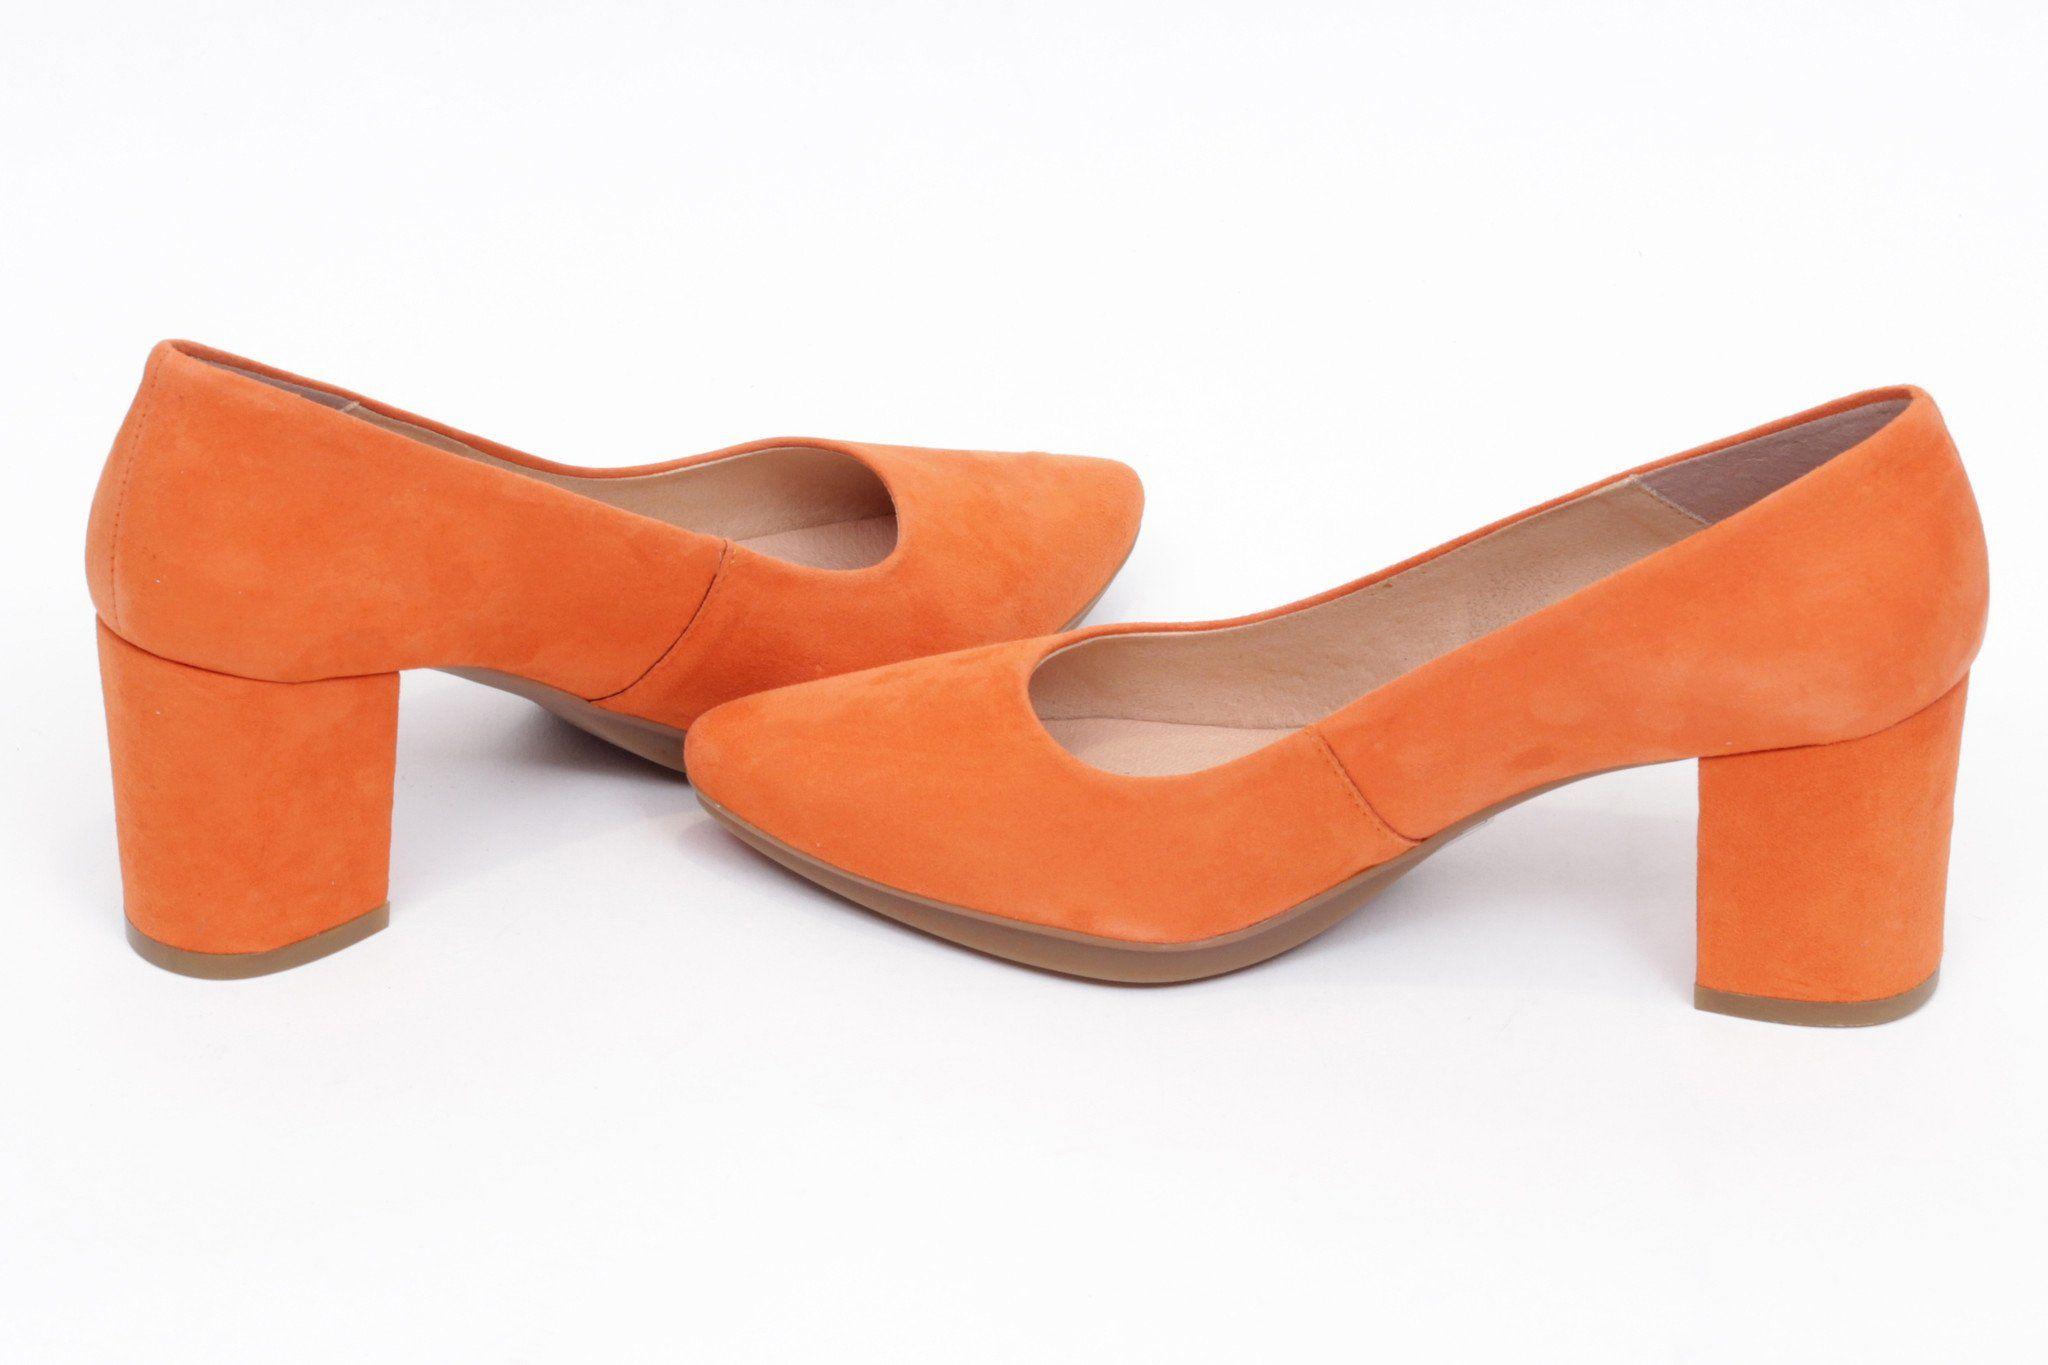 97bc60fd miMaO Urban S naranja - Zapato mujer de tacon salon vestir rojo cómodo -  women high